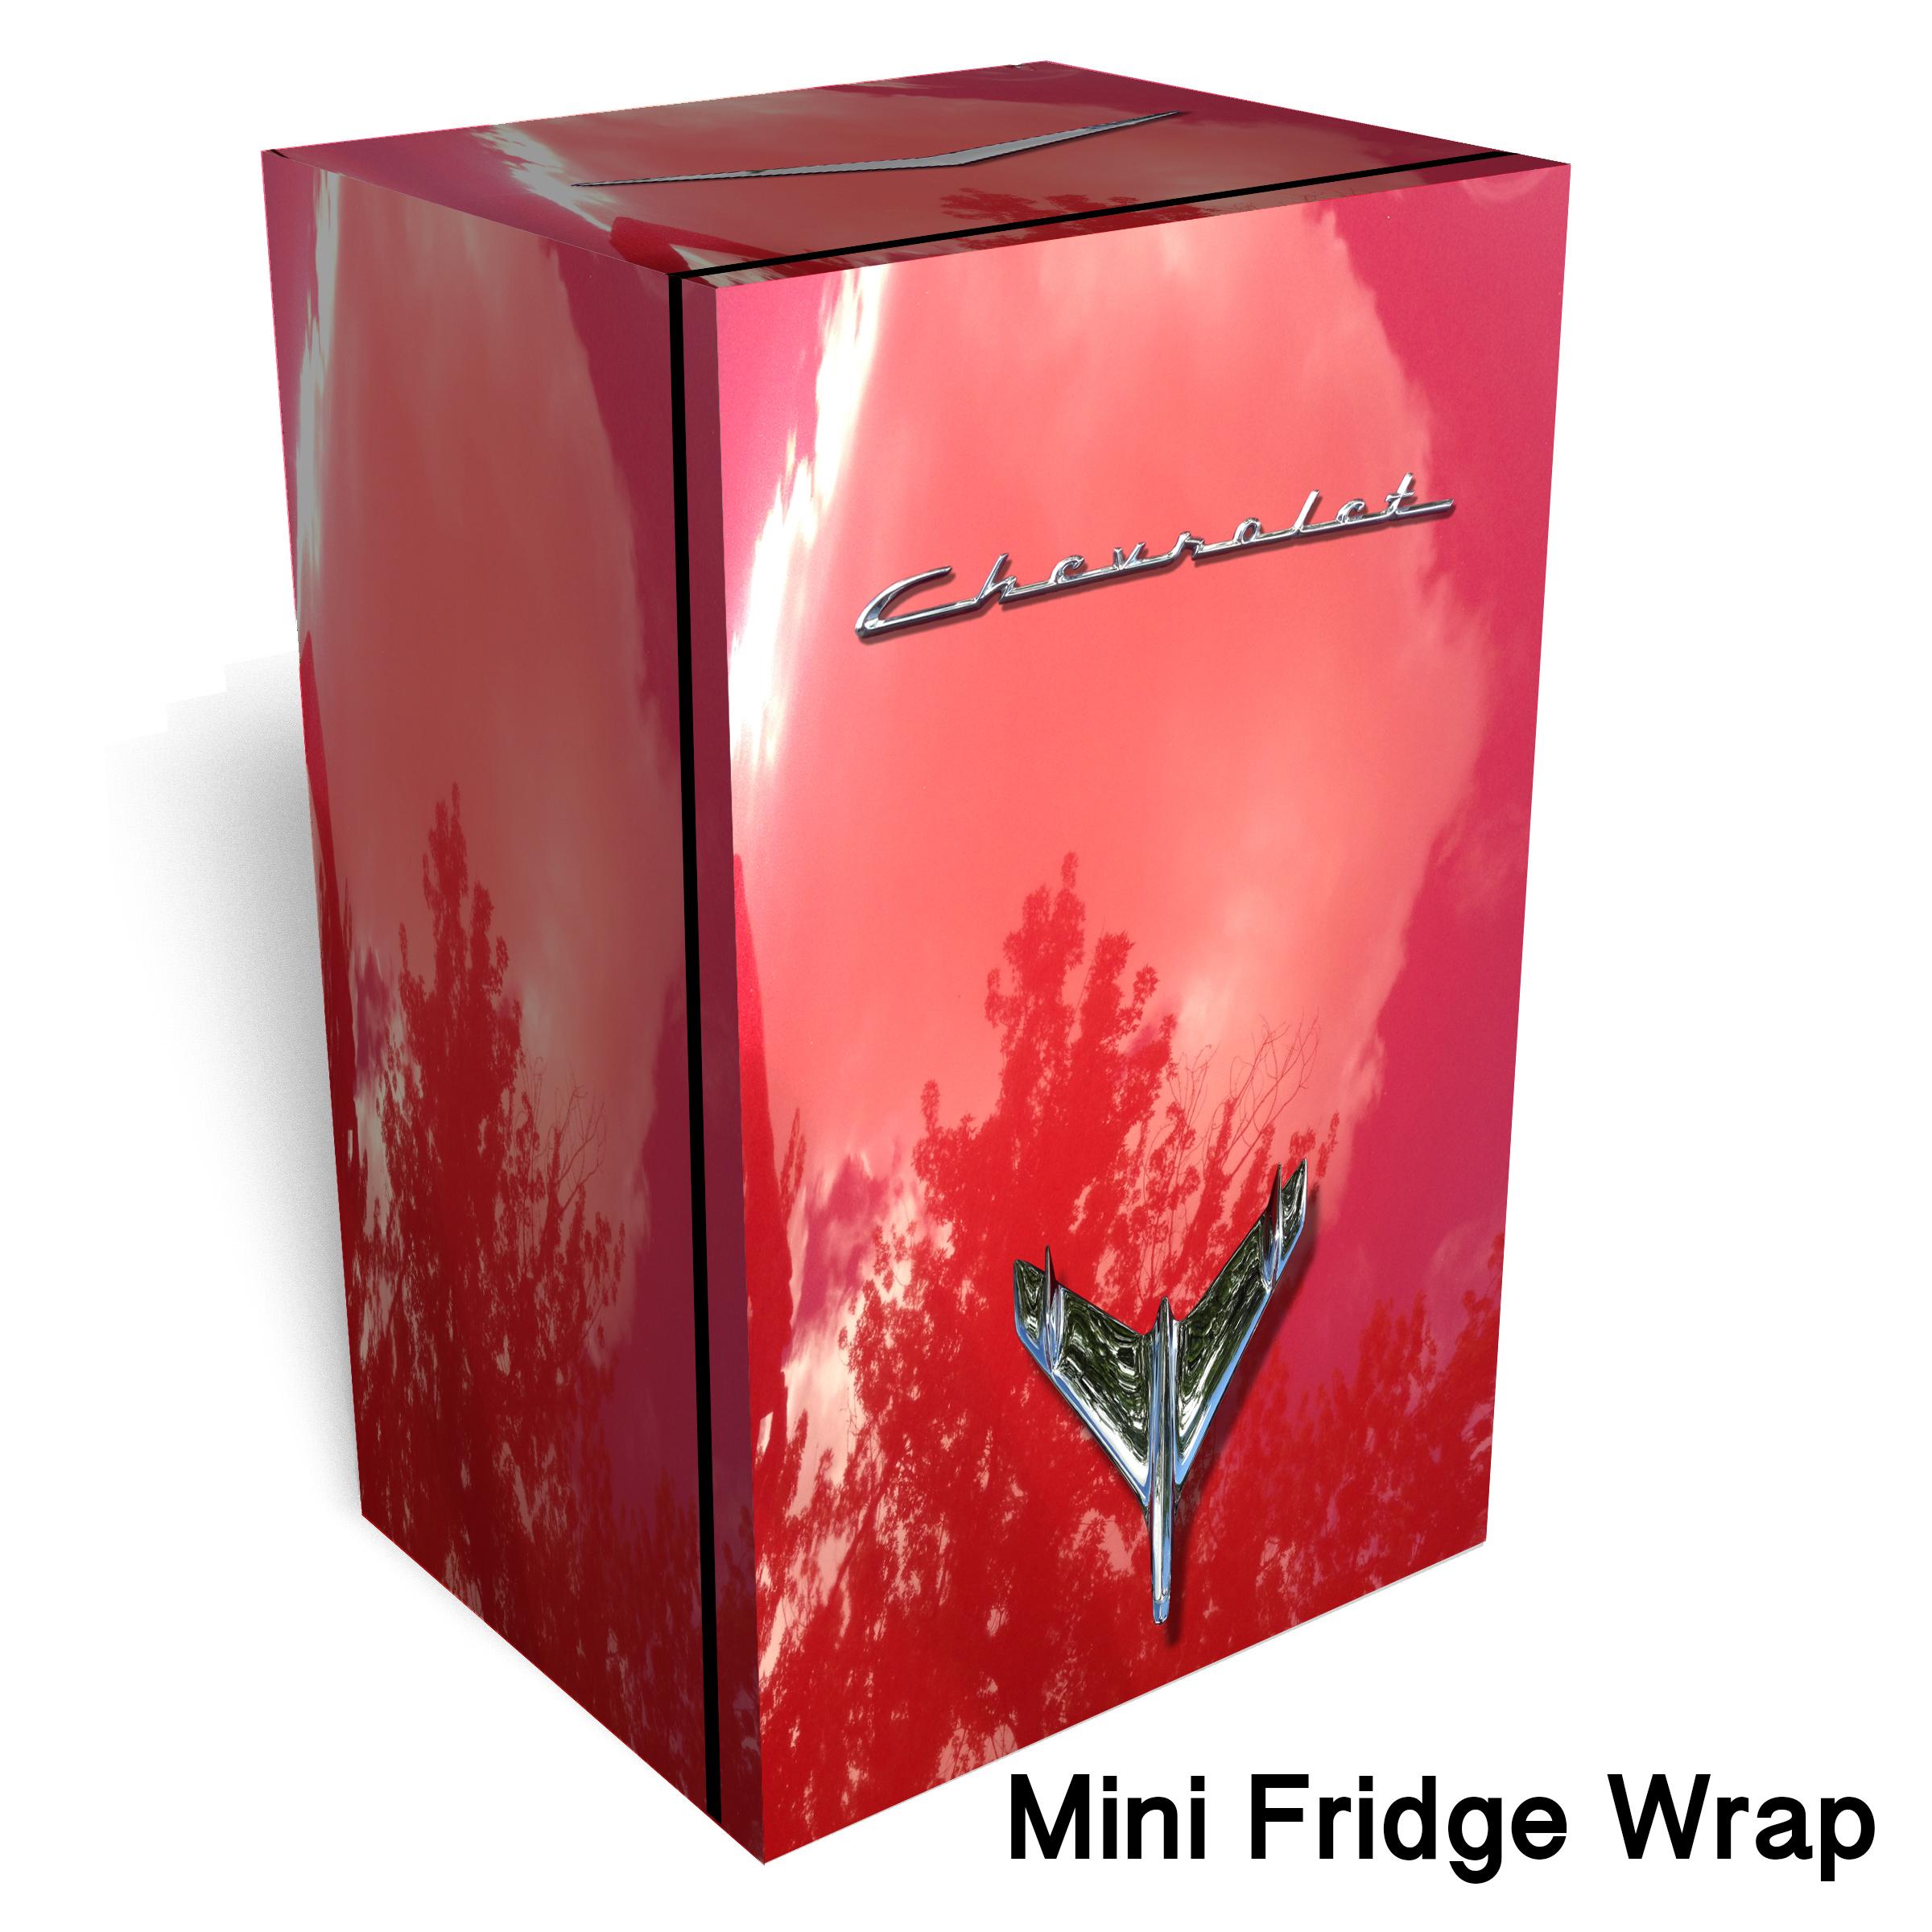 Red Chevrolet mini fridge wrap